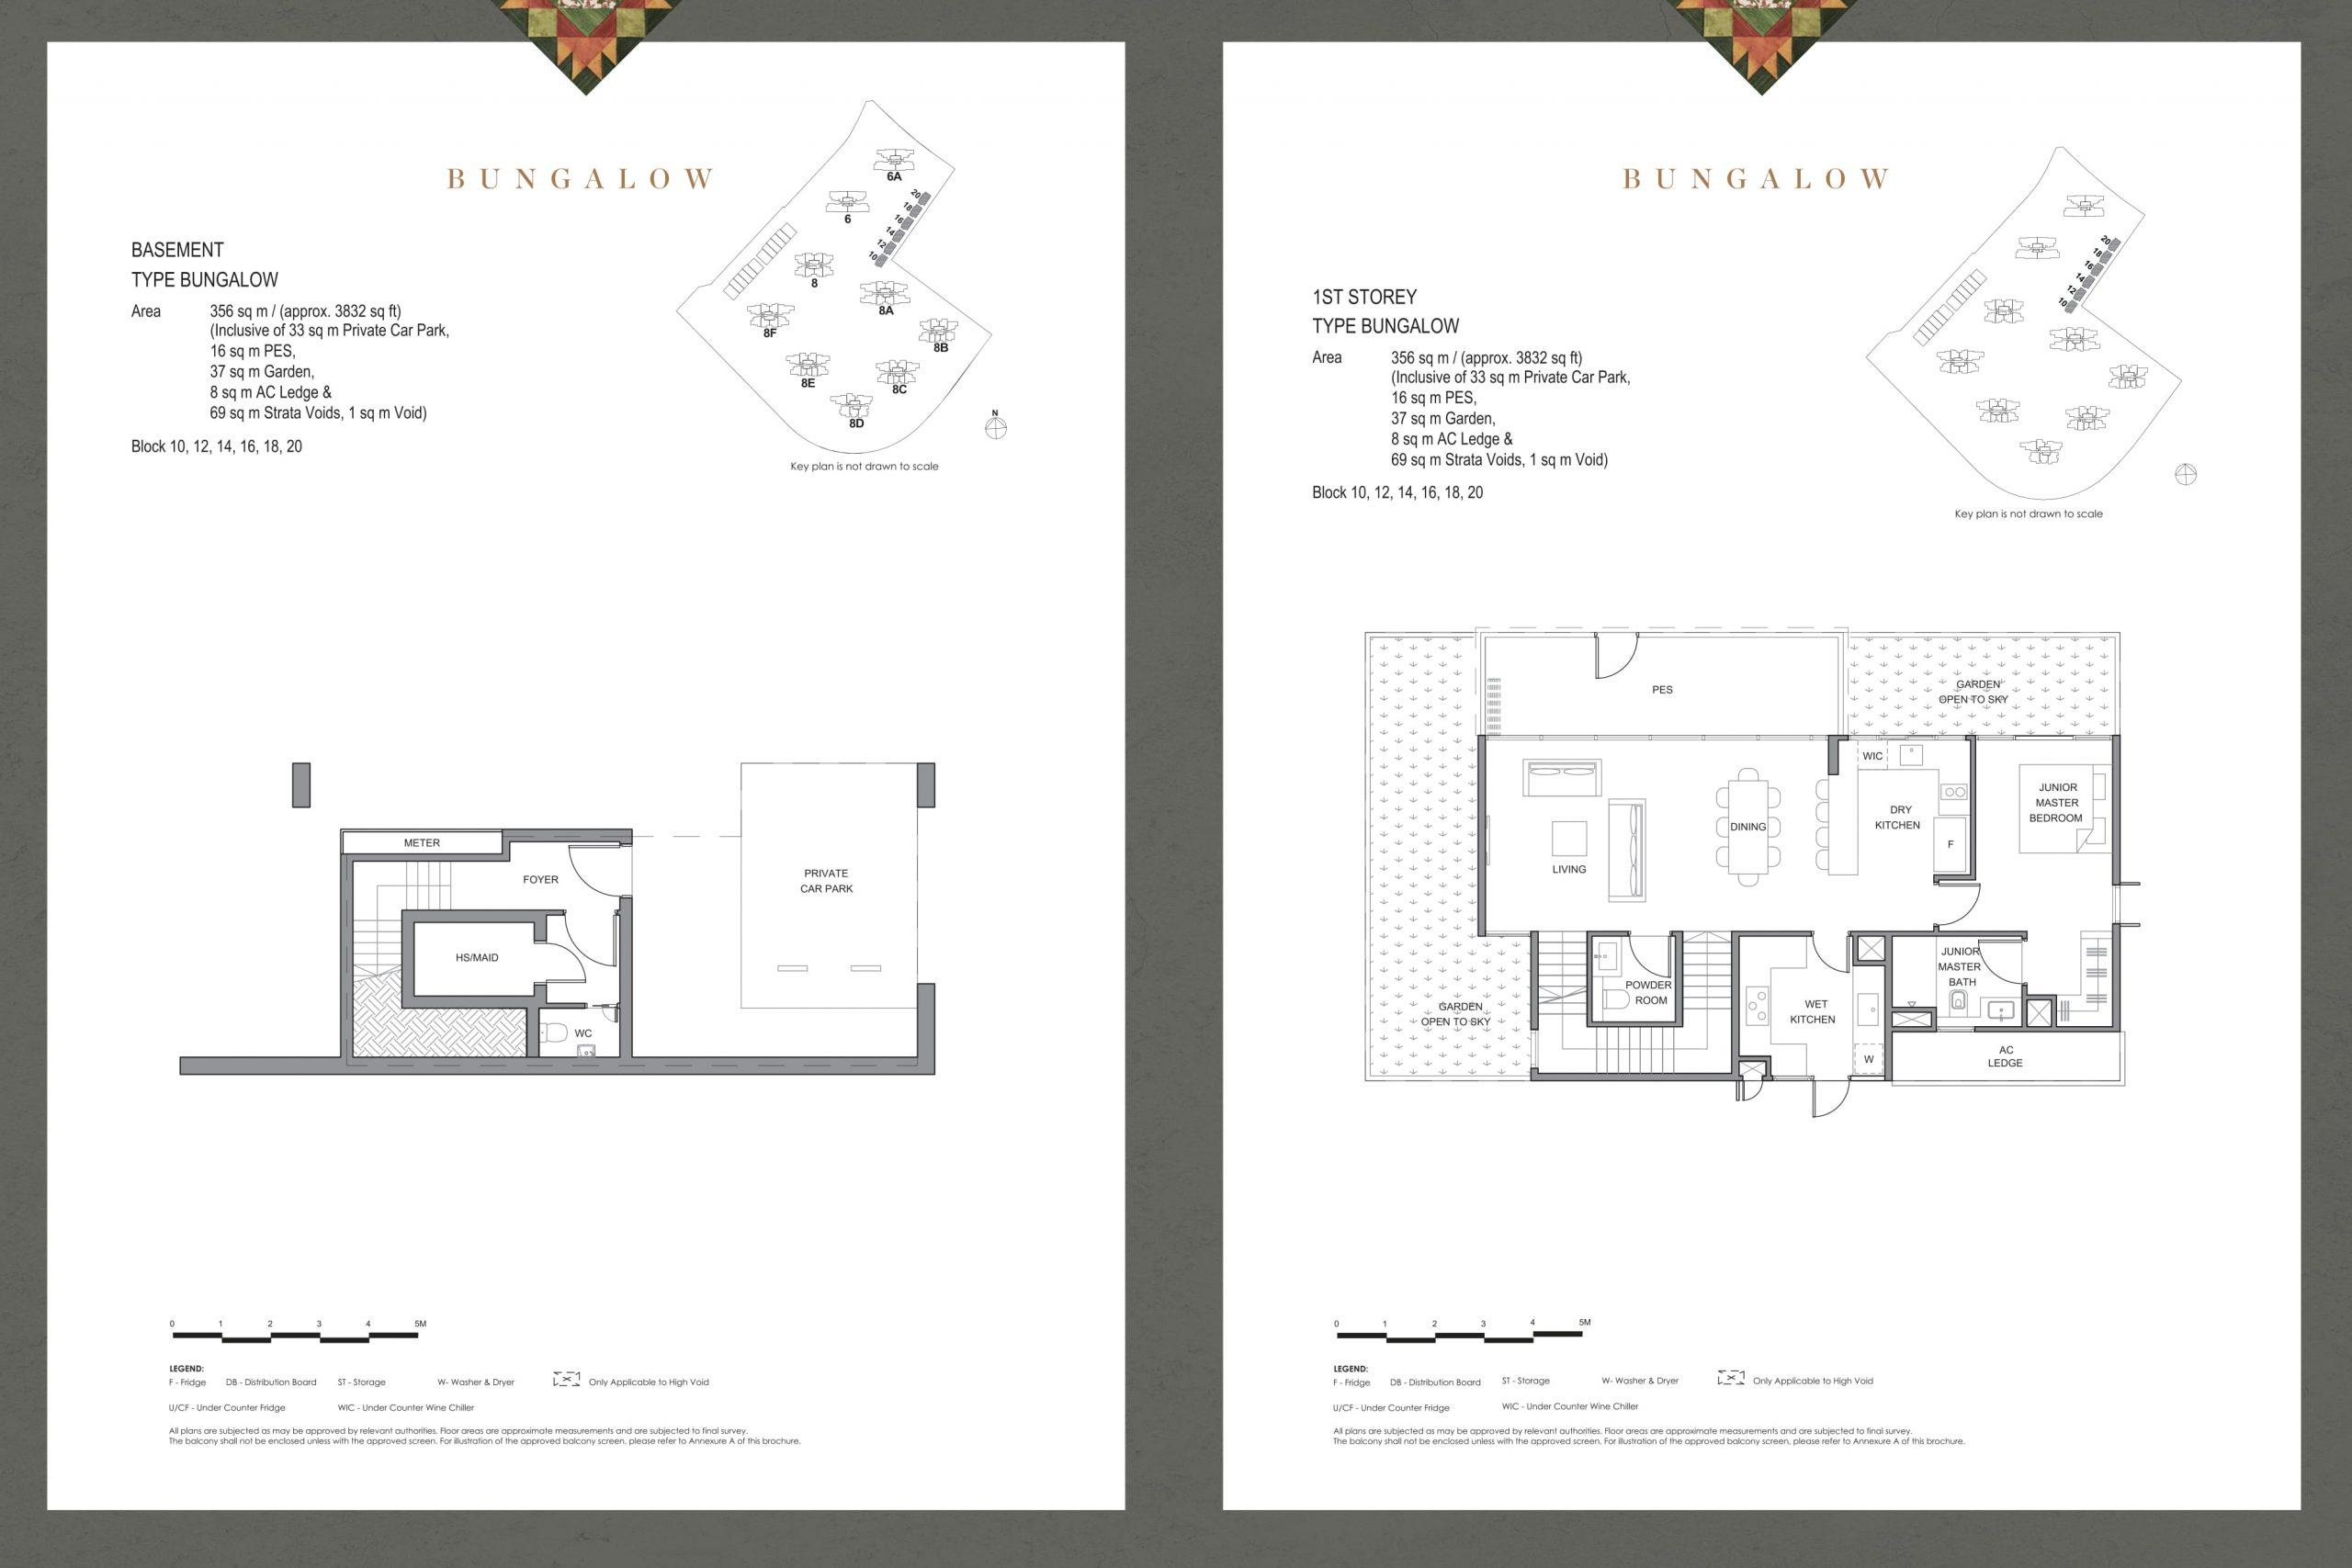 Parc Clematis' masterpiece corner bungalow types